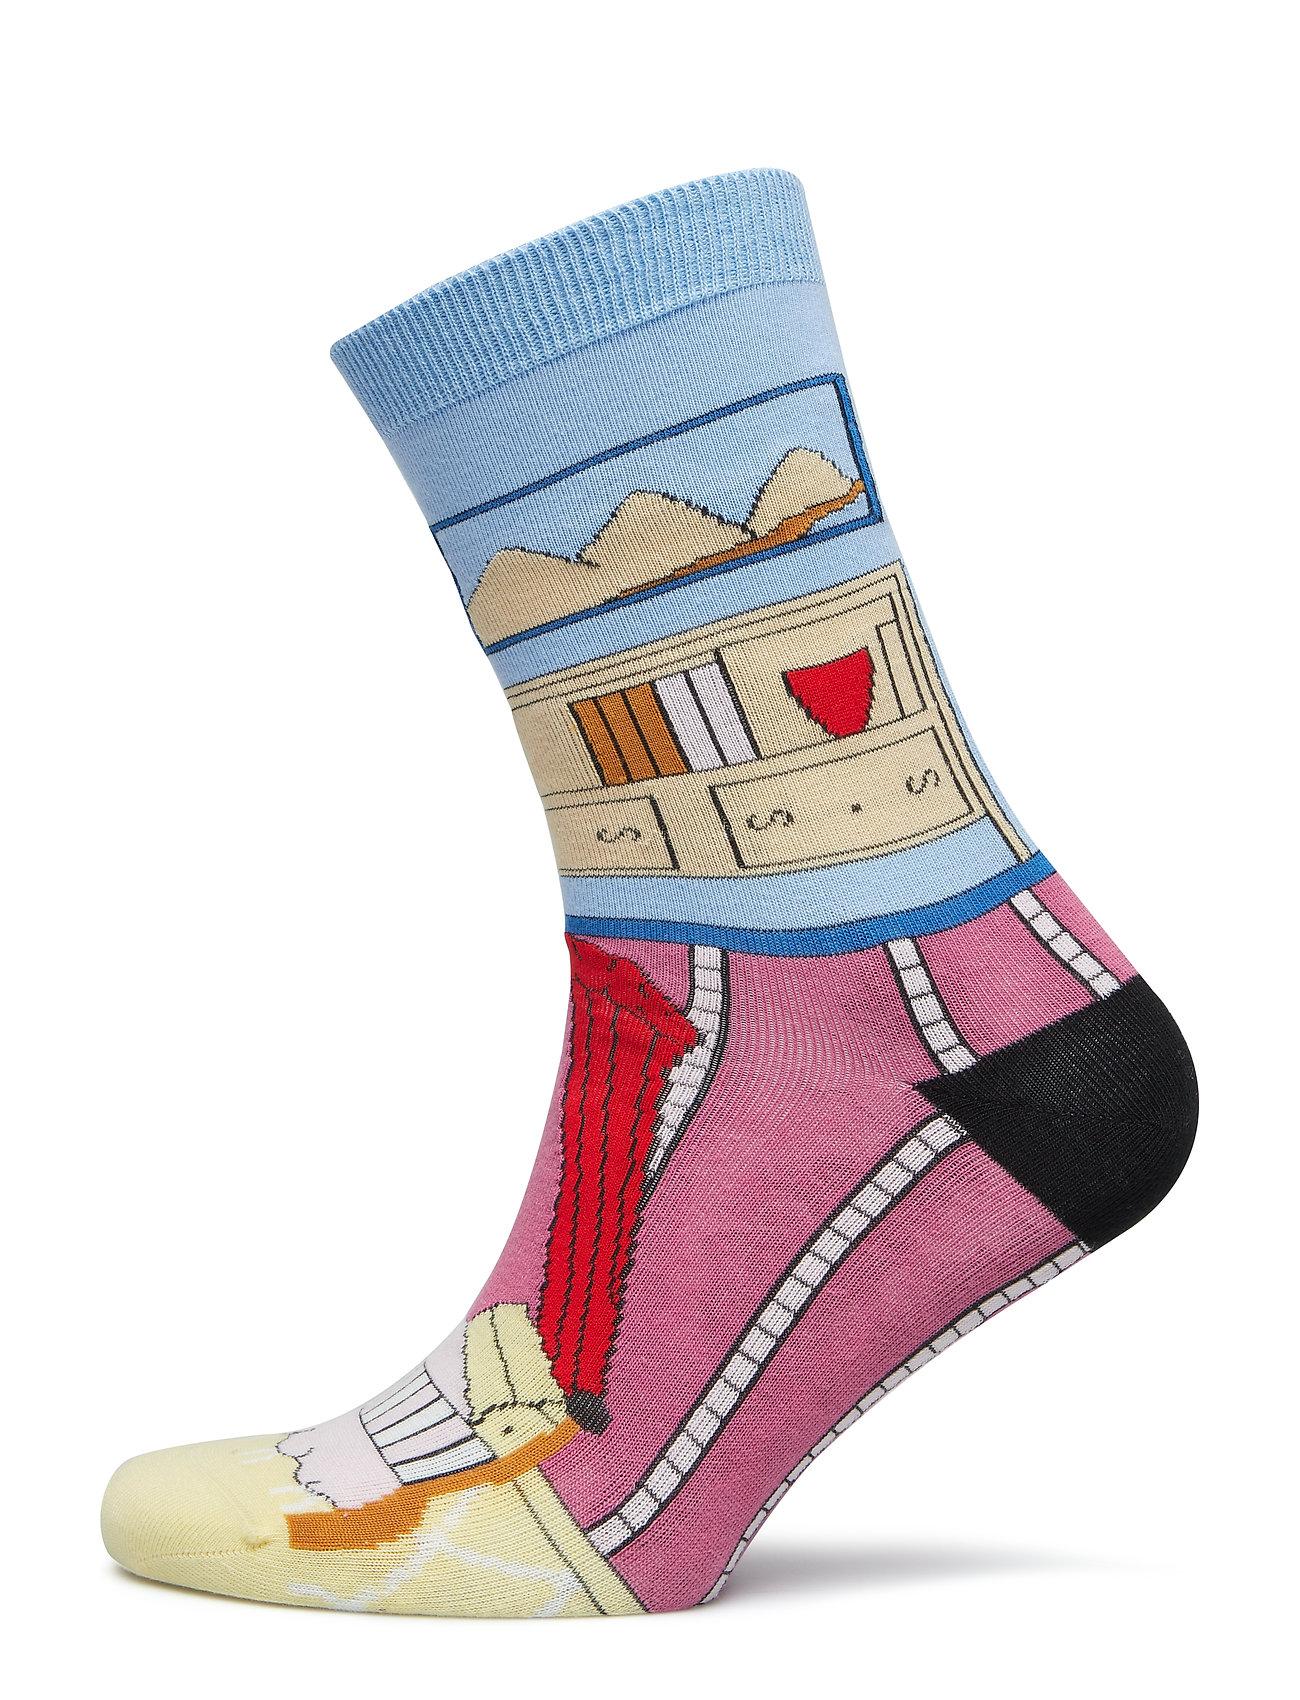 STINE GOYA Iggy, 536 Socks